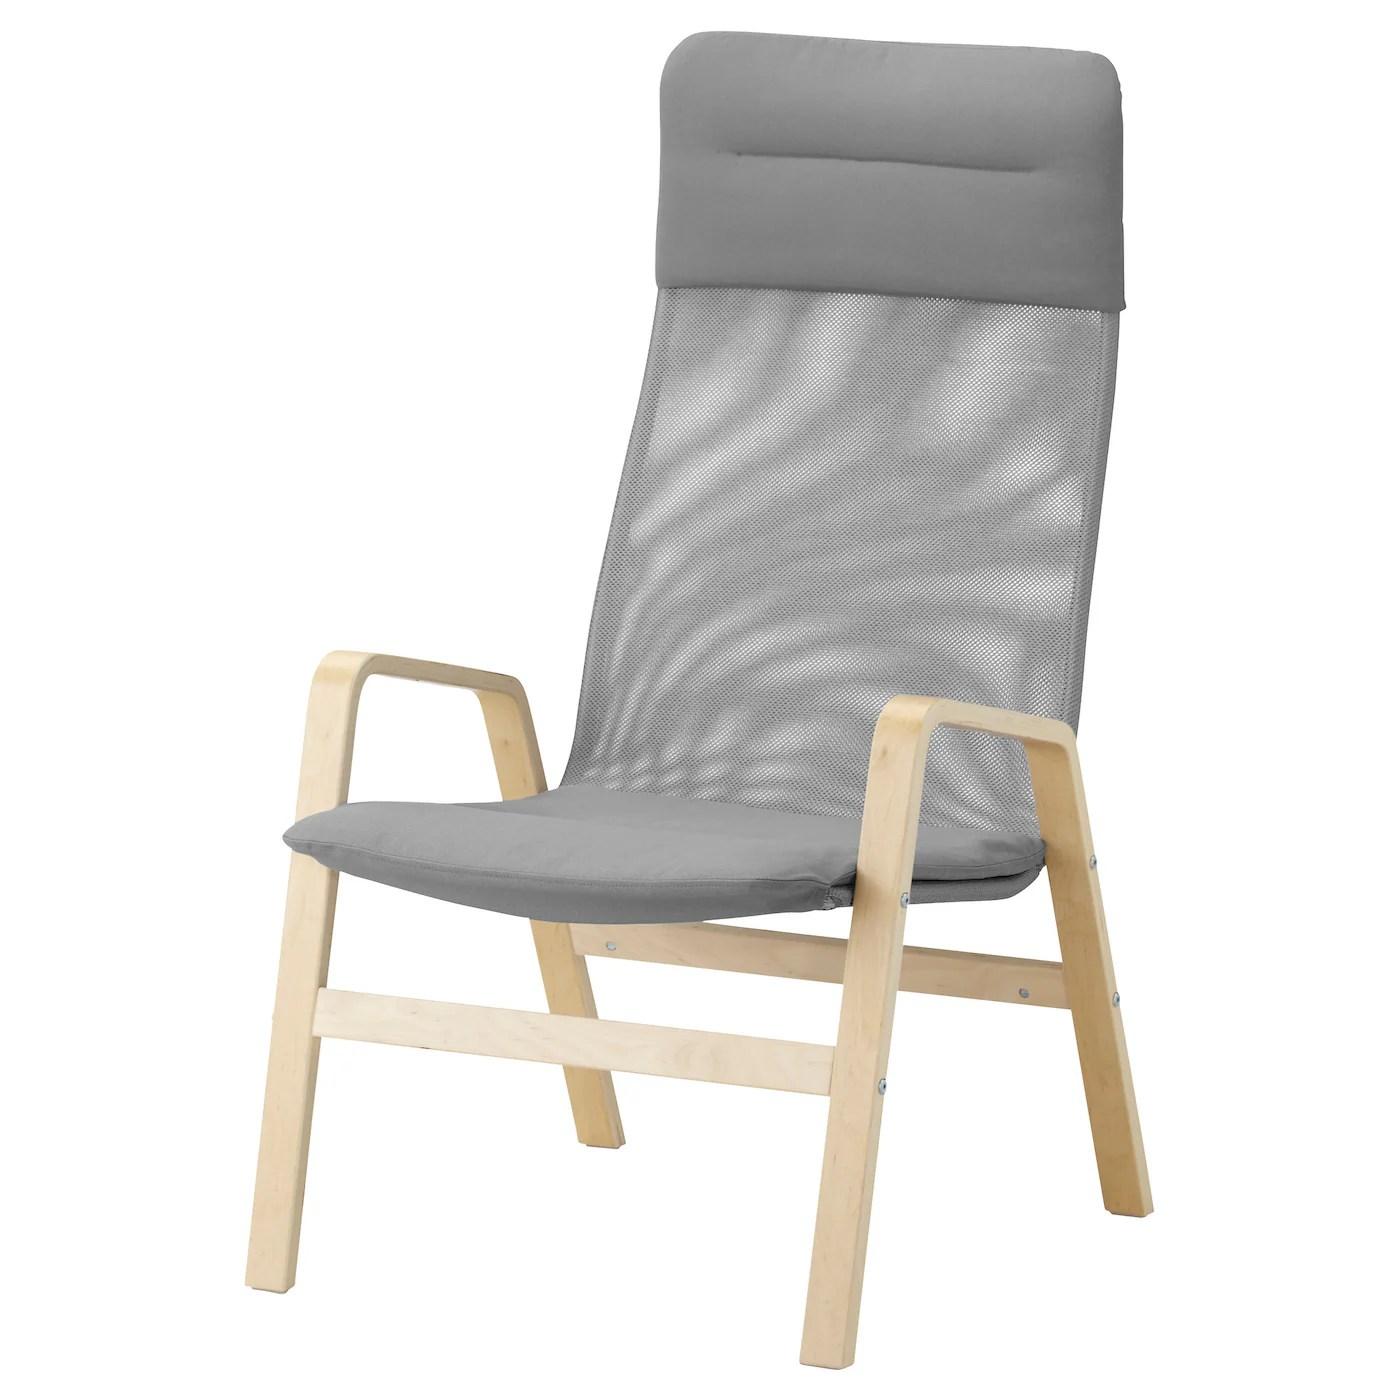 ikea high chair office mat staples canada nolbyn back armchair birch veneer grey